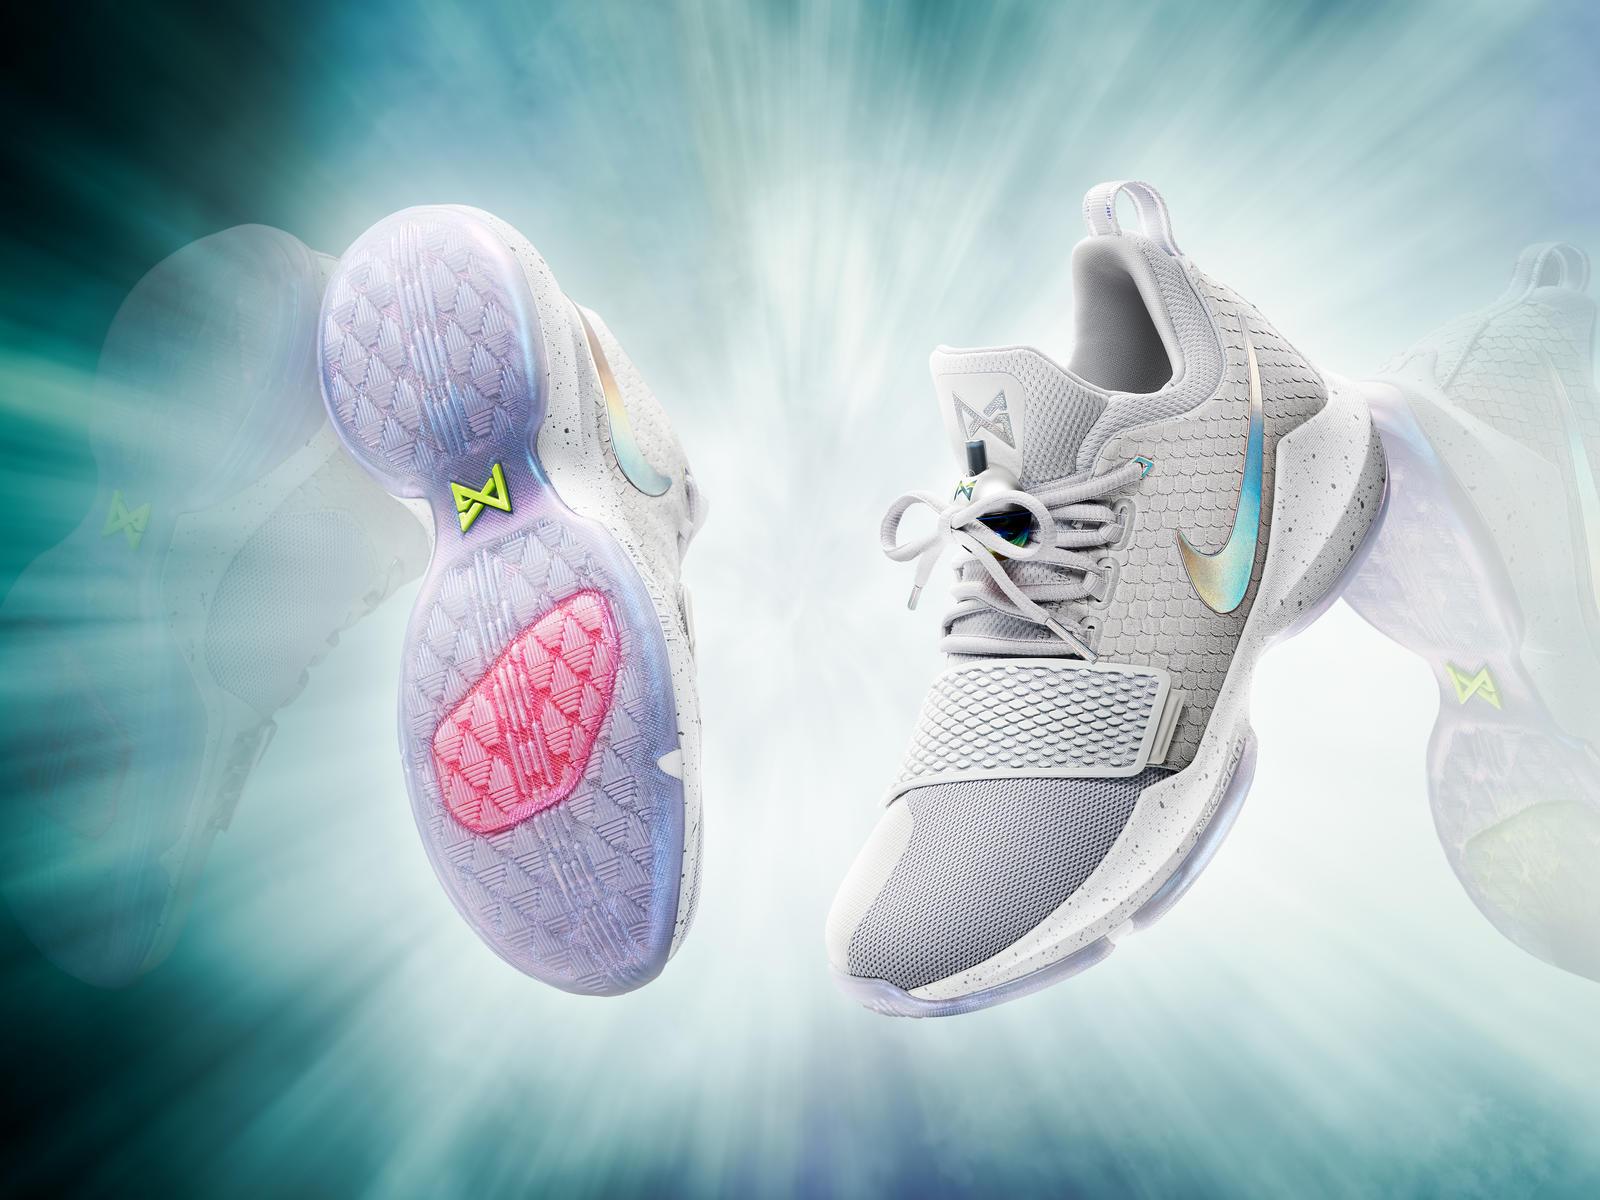 16-420_Nike_PG1_Hero_Pair_Gray-03a_native_1600